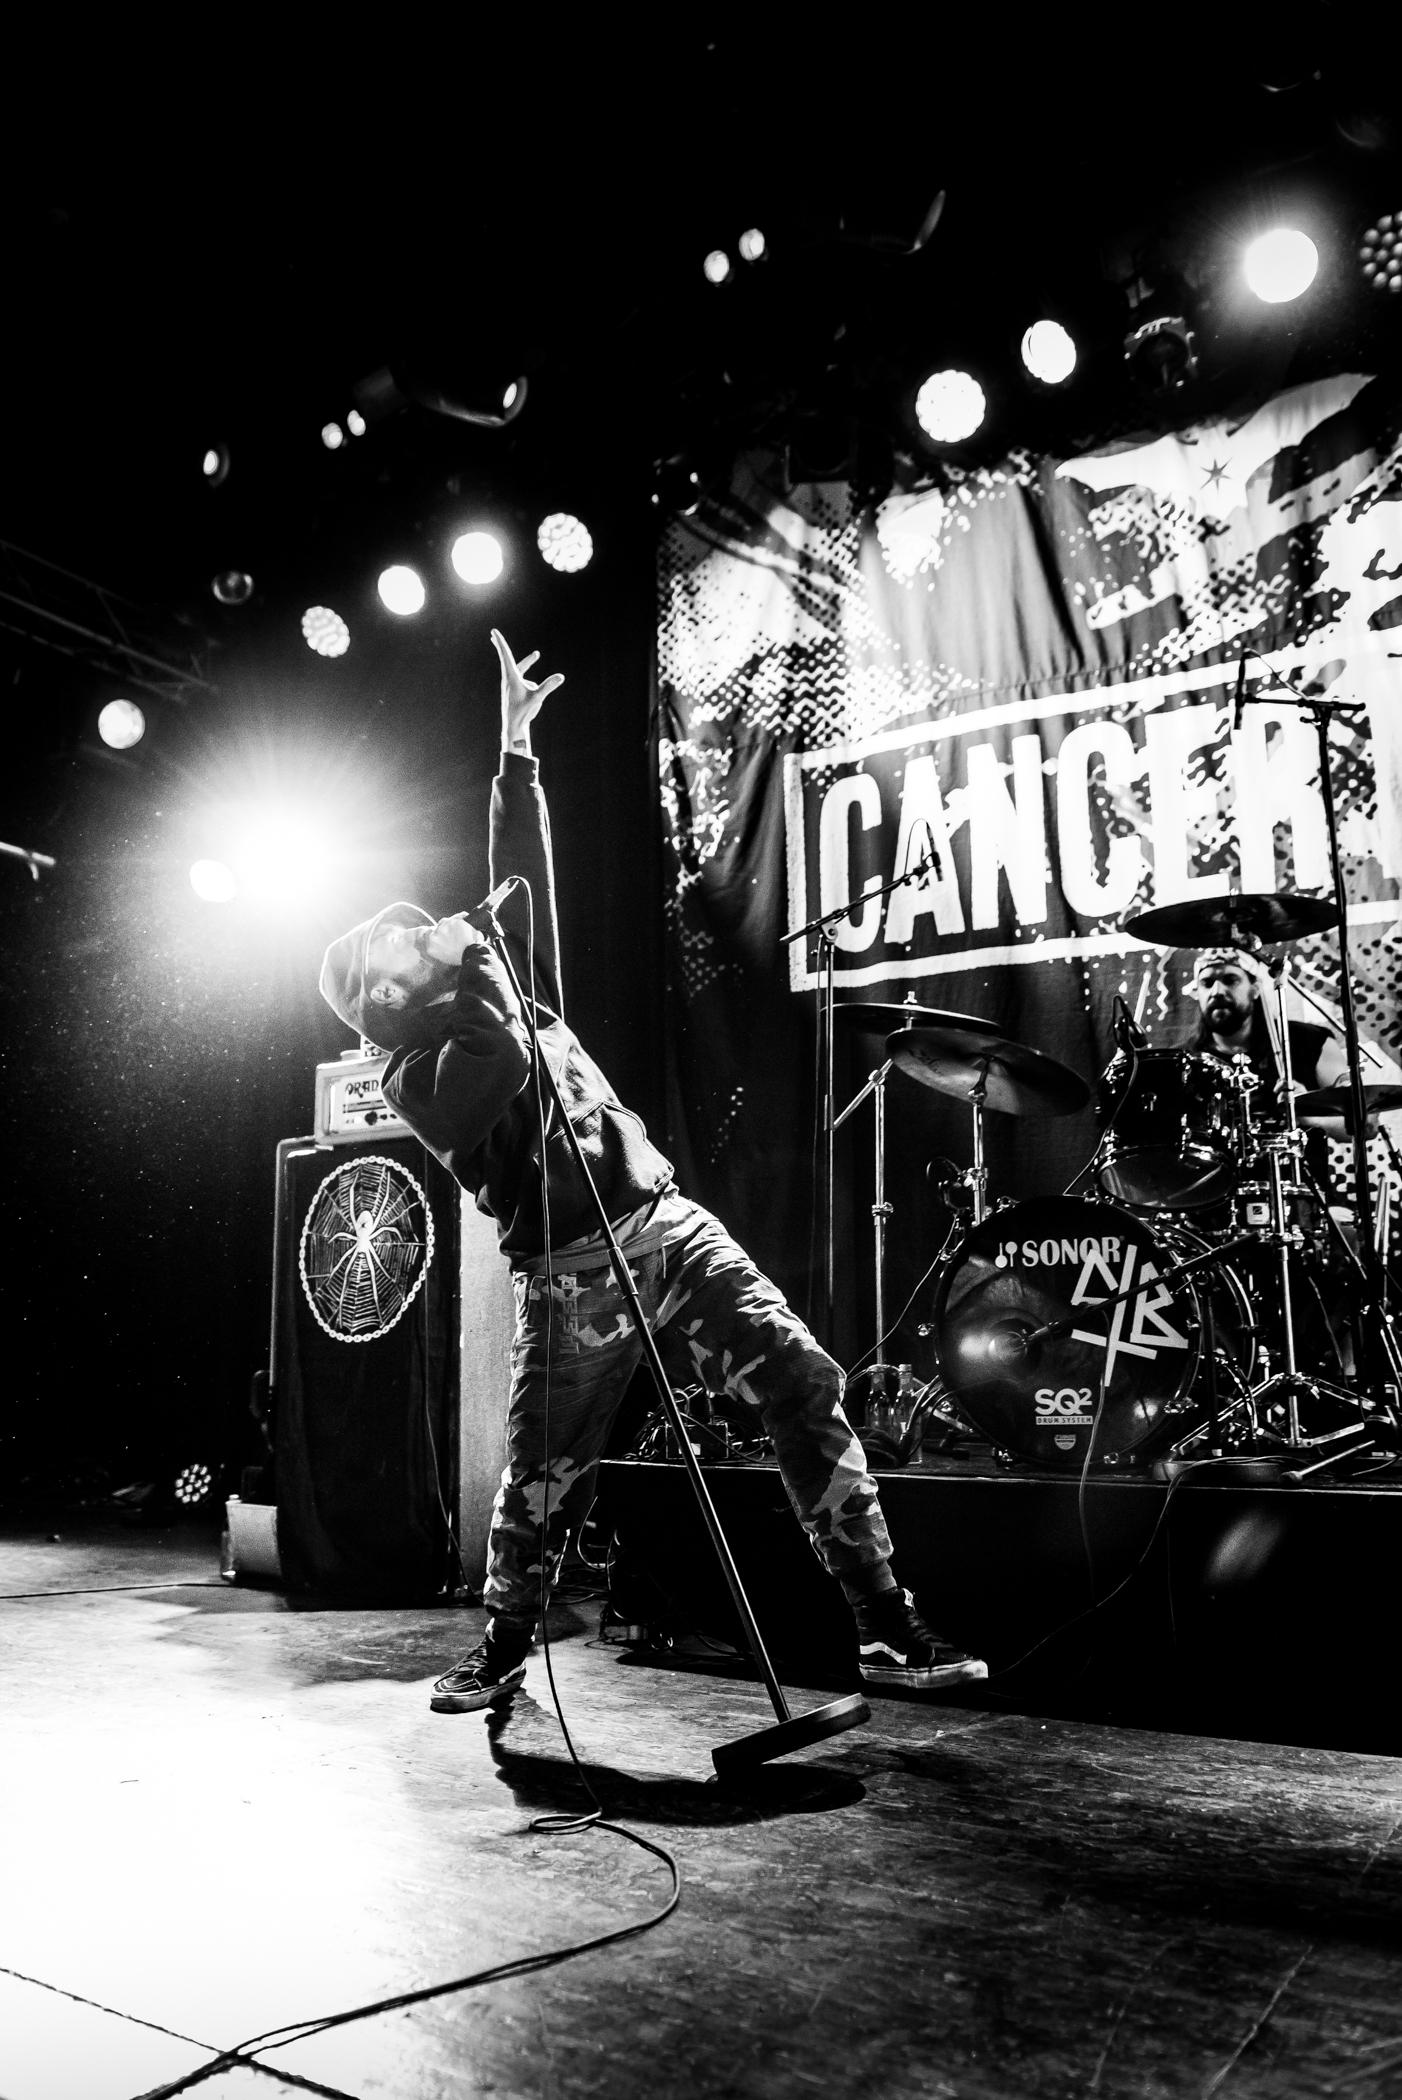 20190324_CancerBats_0046_WEB.jpg